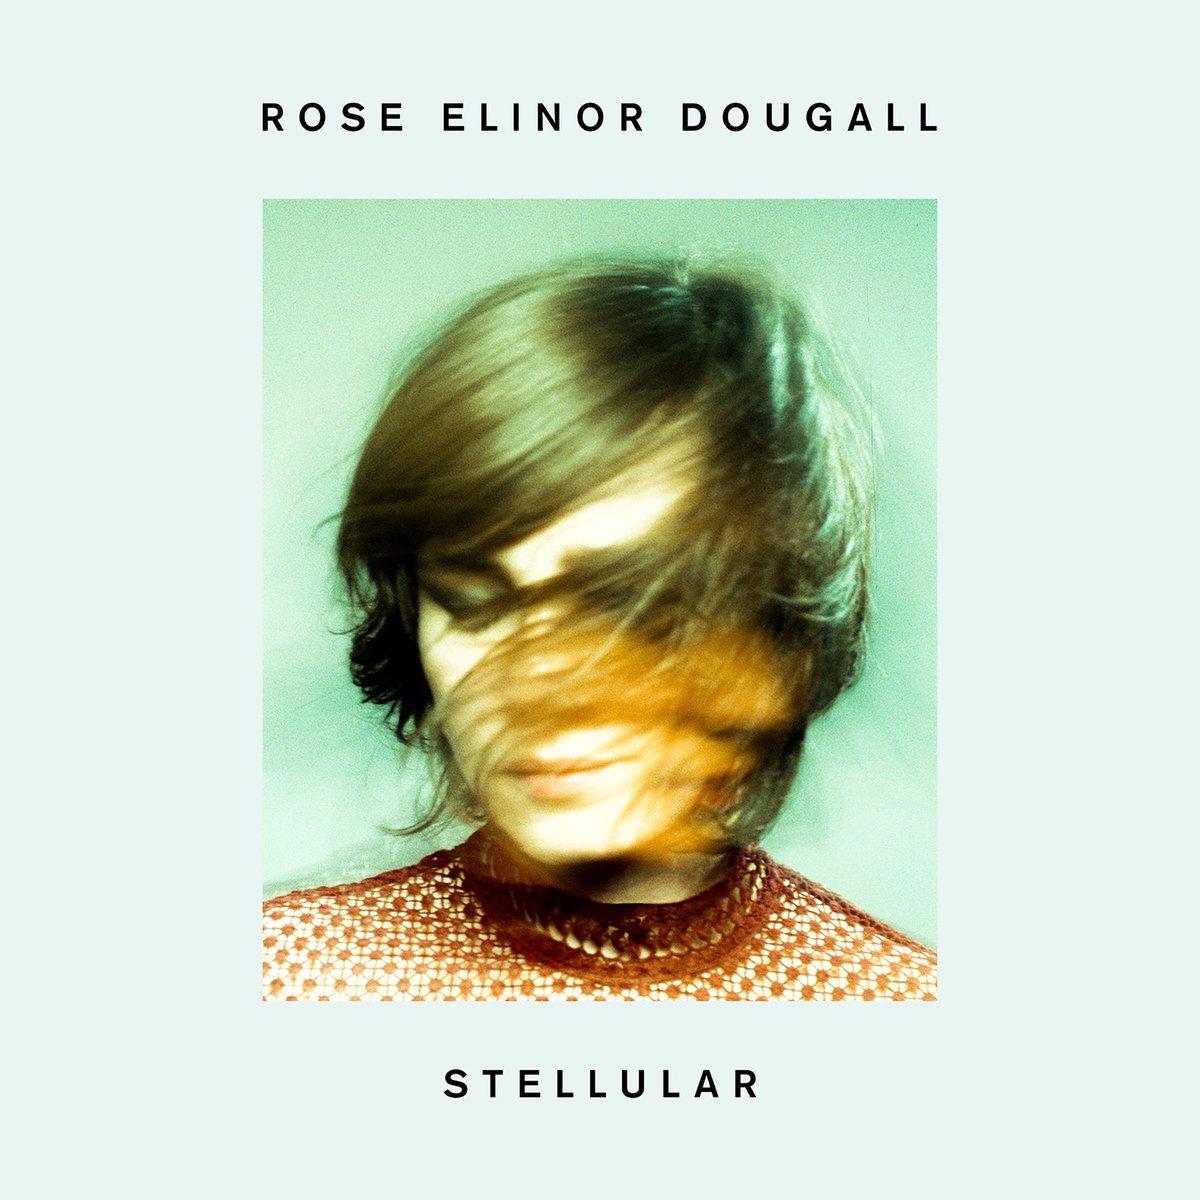 Stellular